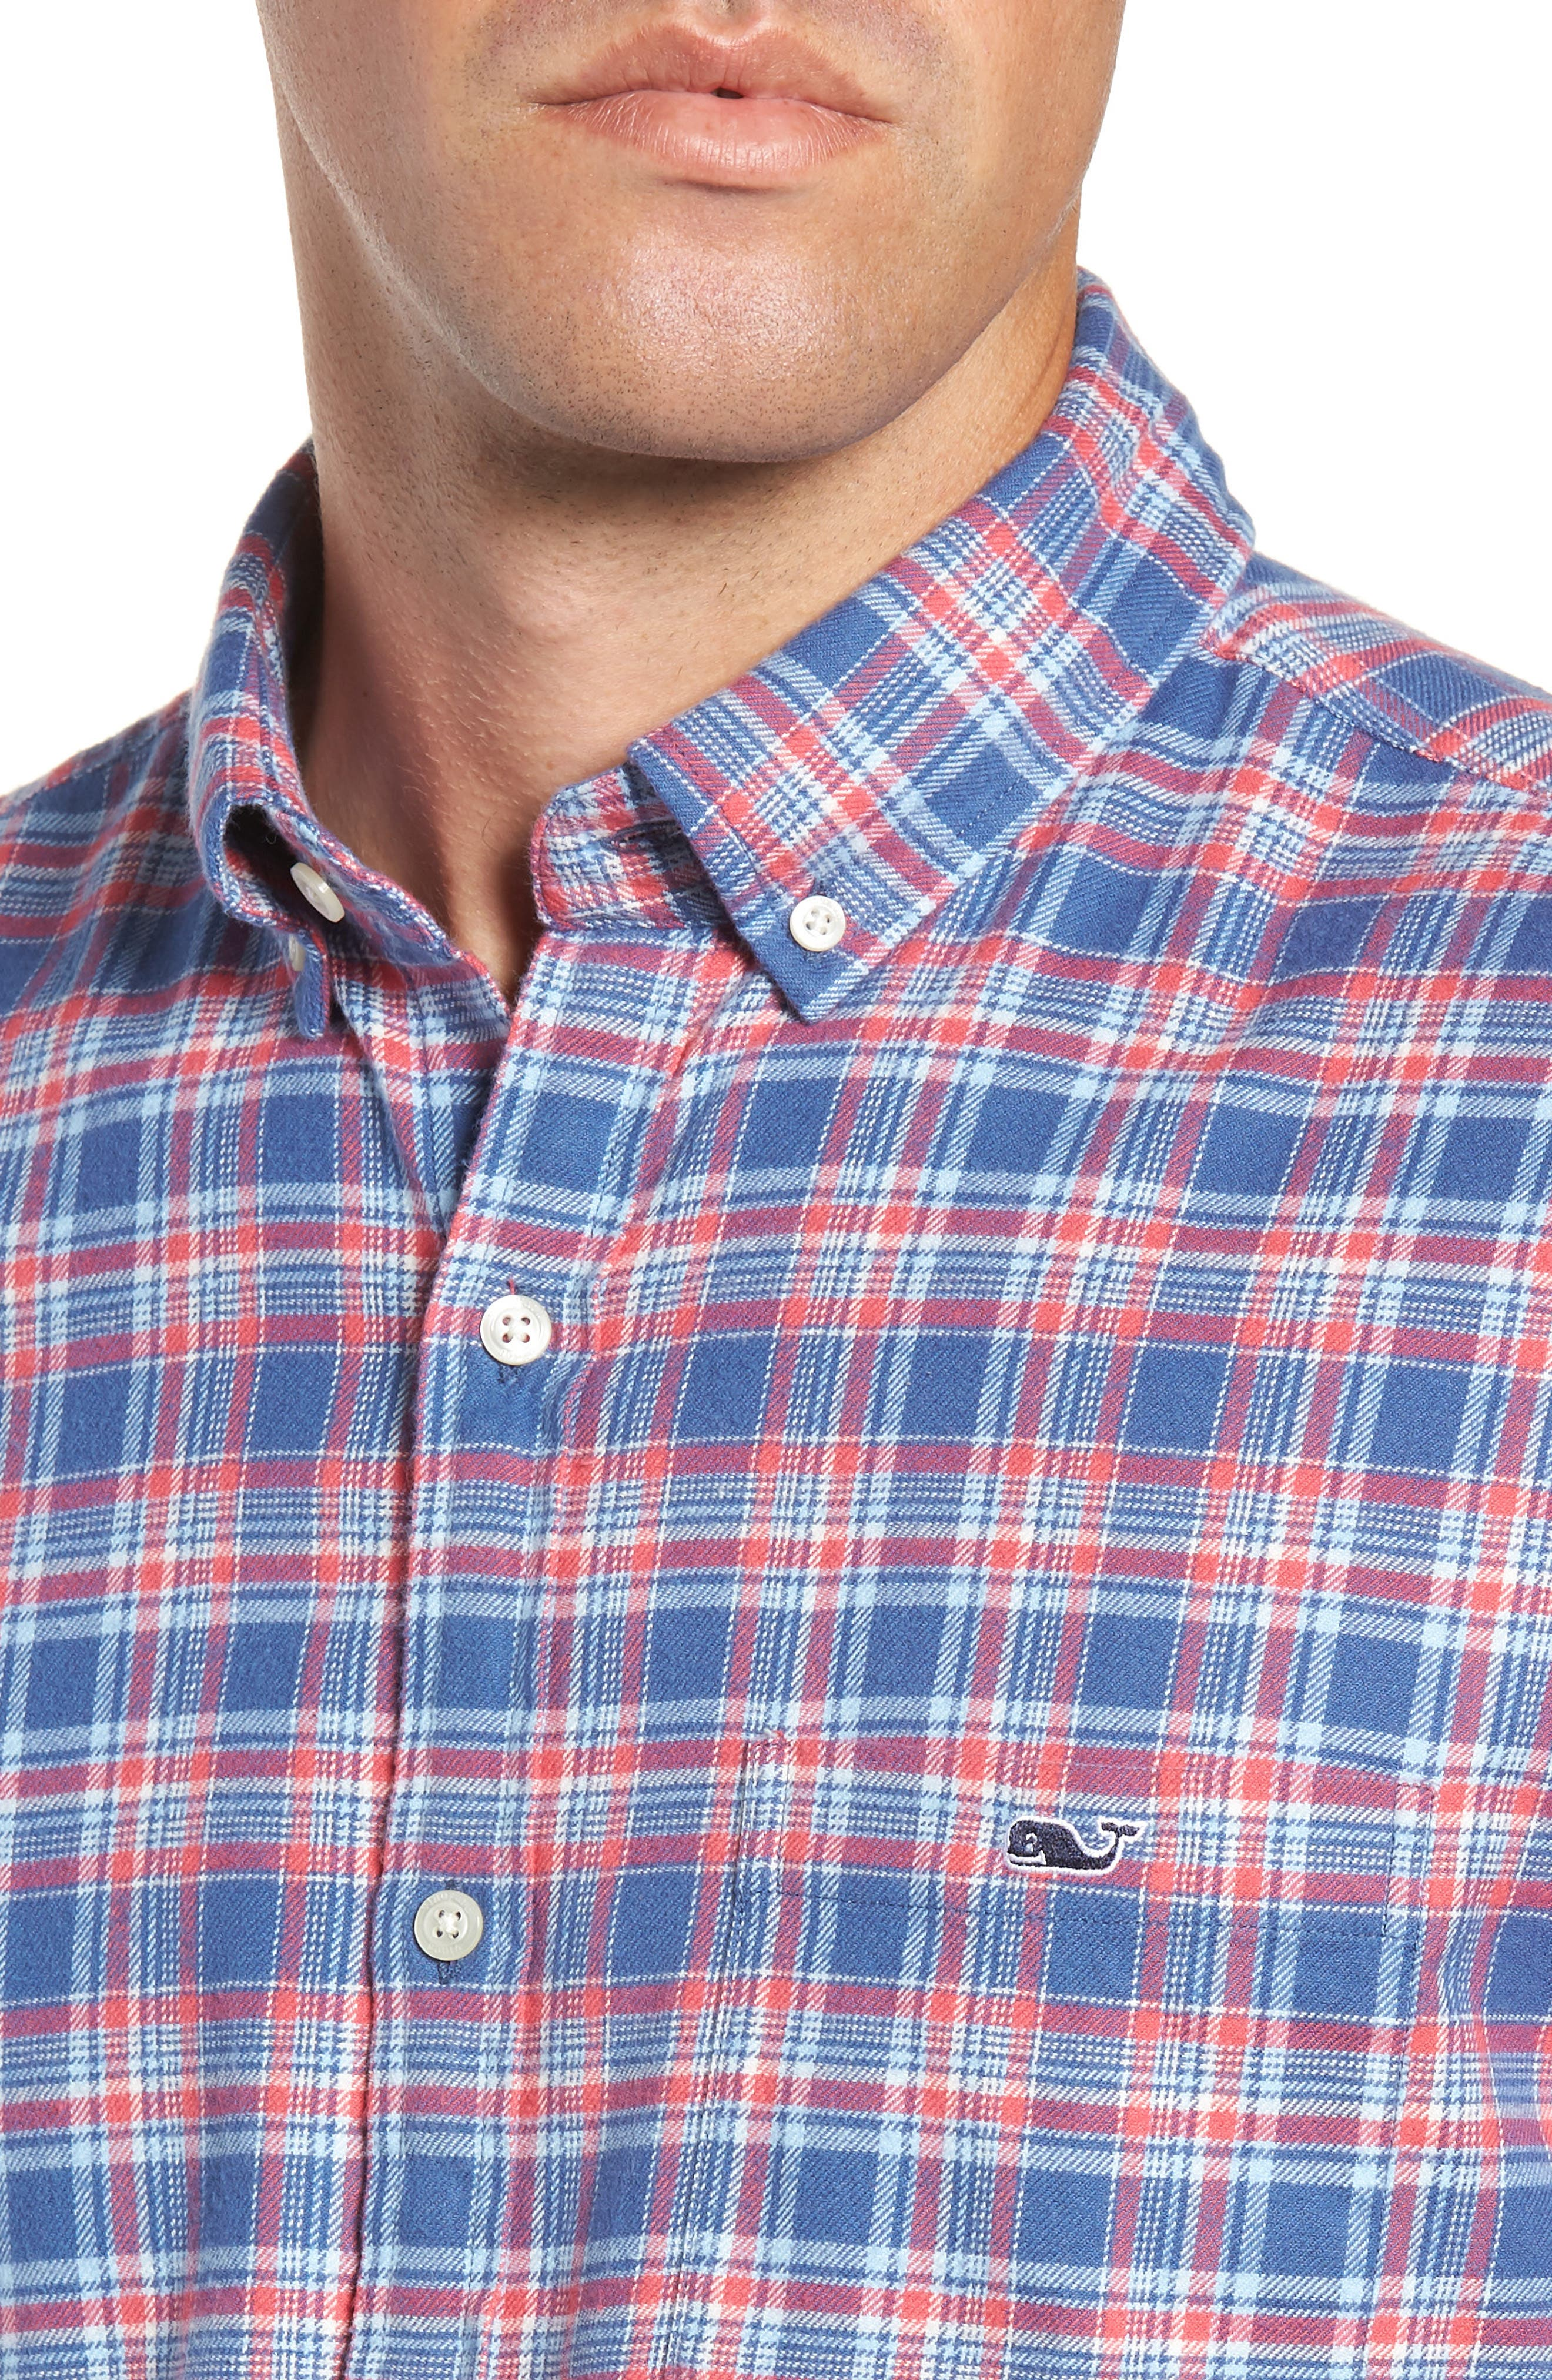 VINEYARD VINES,                             Lockwood Regular Fit Plaid Flannel Shirt,                             Alternate thumbnail 2, color,                             463